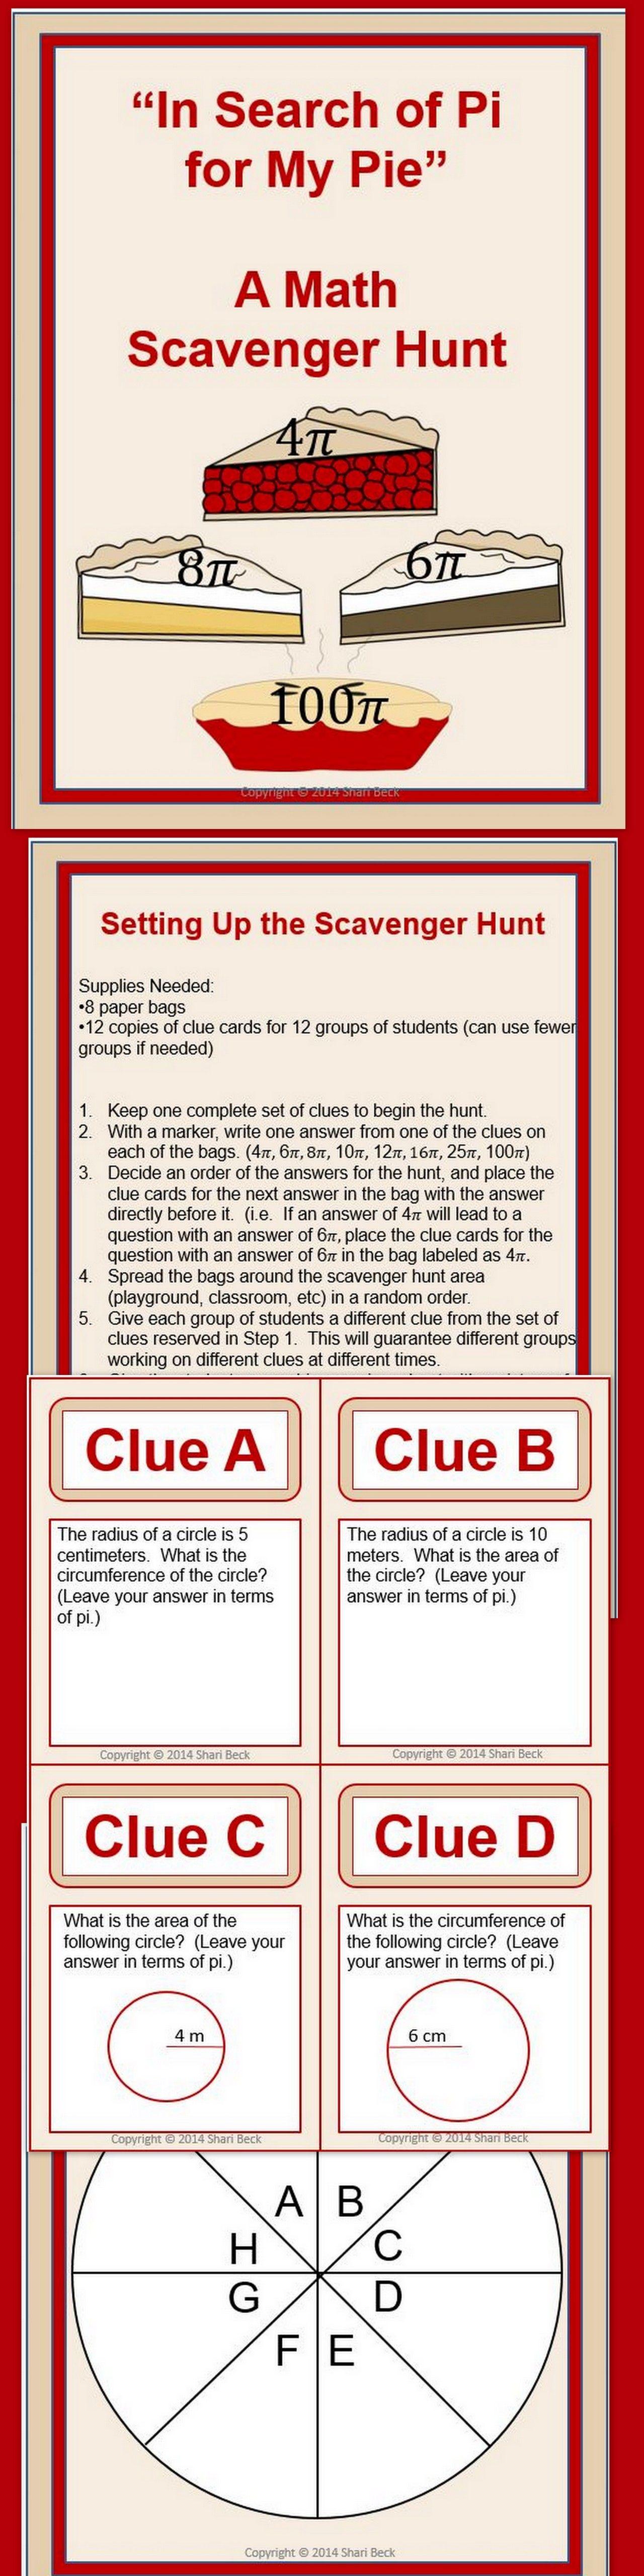 National Pi Day Scavenger Hunt Math High School Math Middle School Math [ 5120 x 1280 Pixel ]